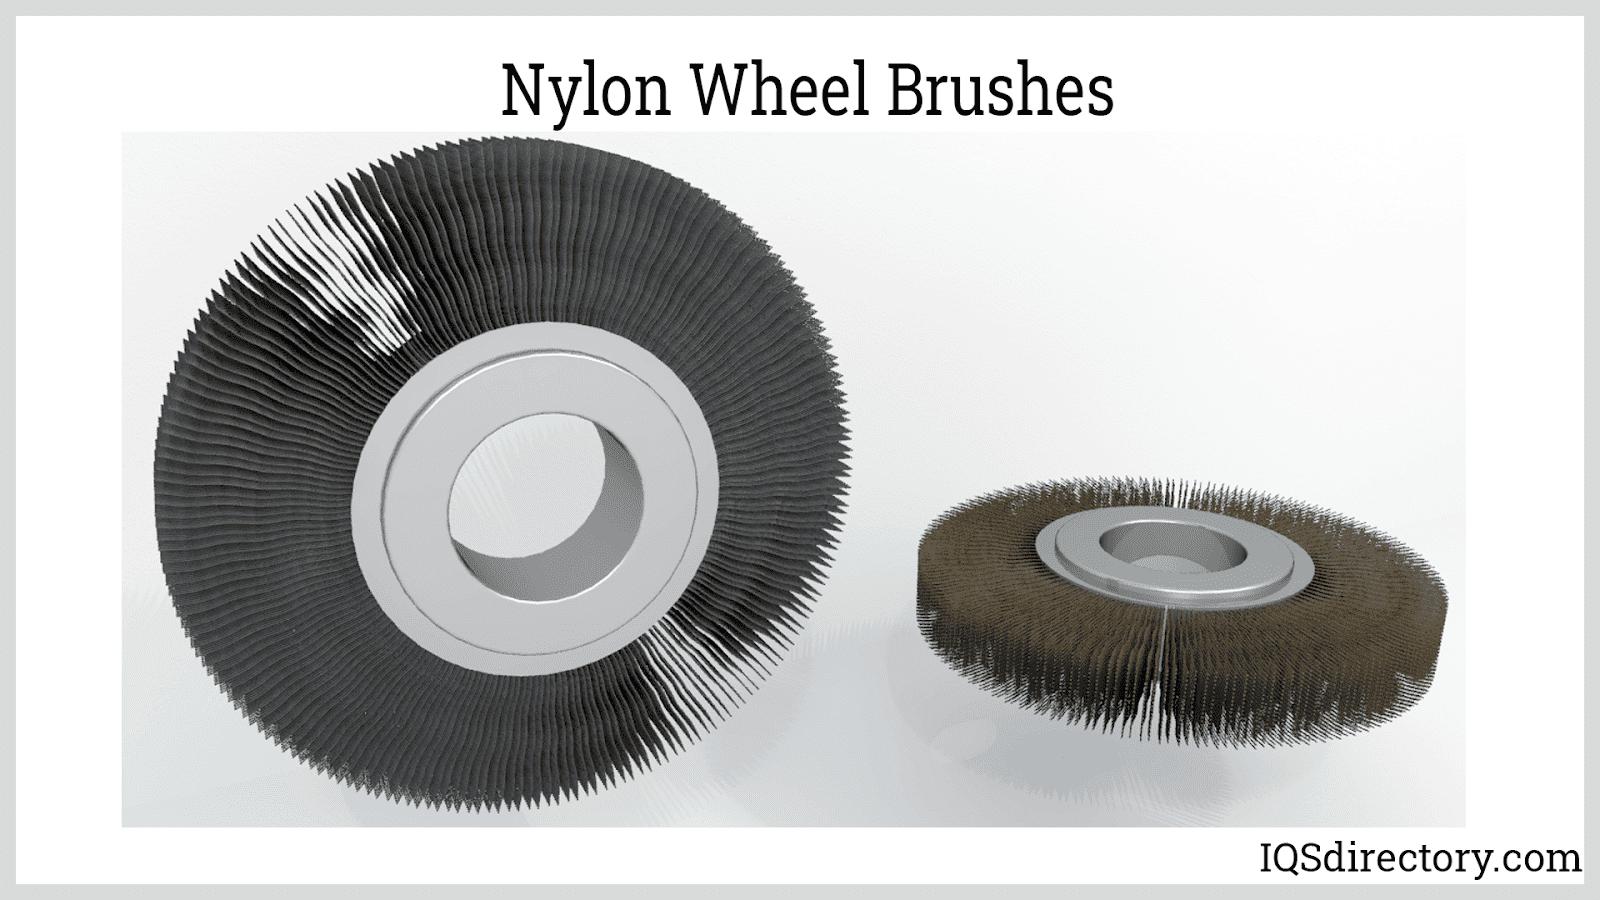 Nylon Wheel Brushes